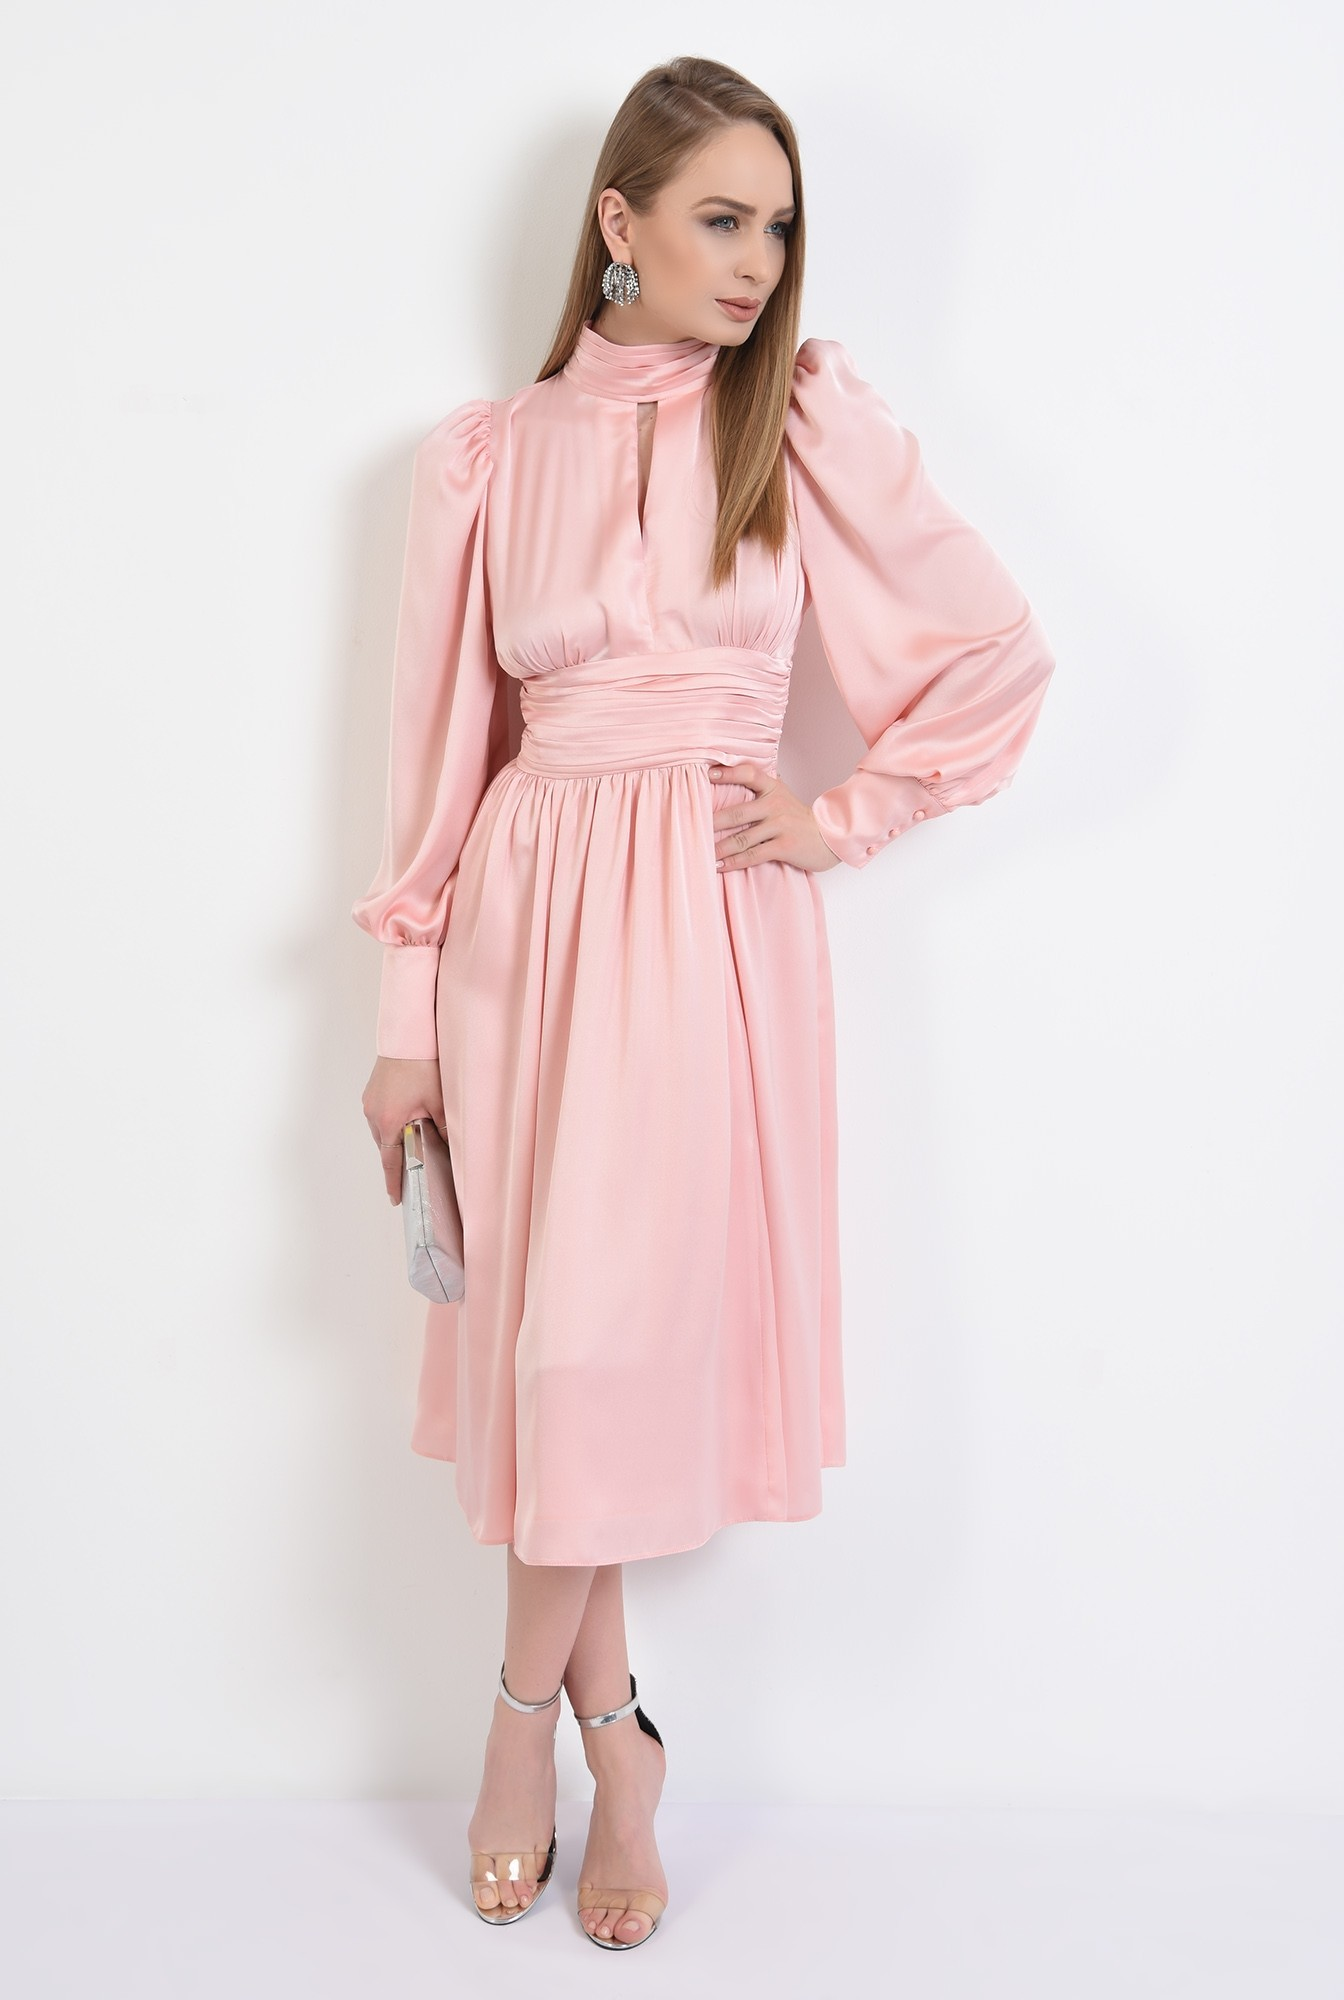 3 - 360 - rochie eleganta, din satin, evazata, midi, brau fronsat, roz